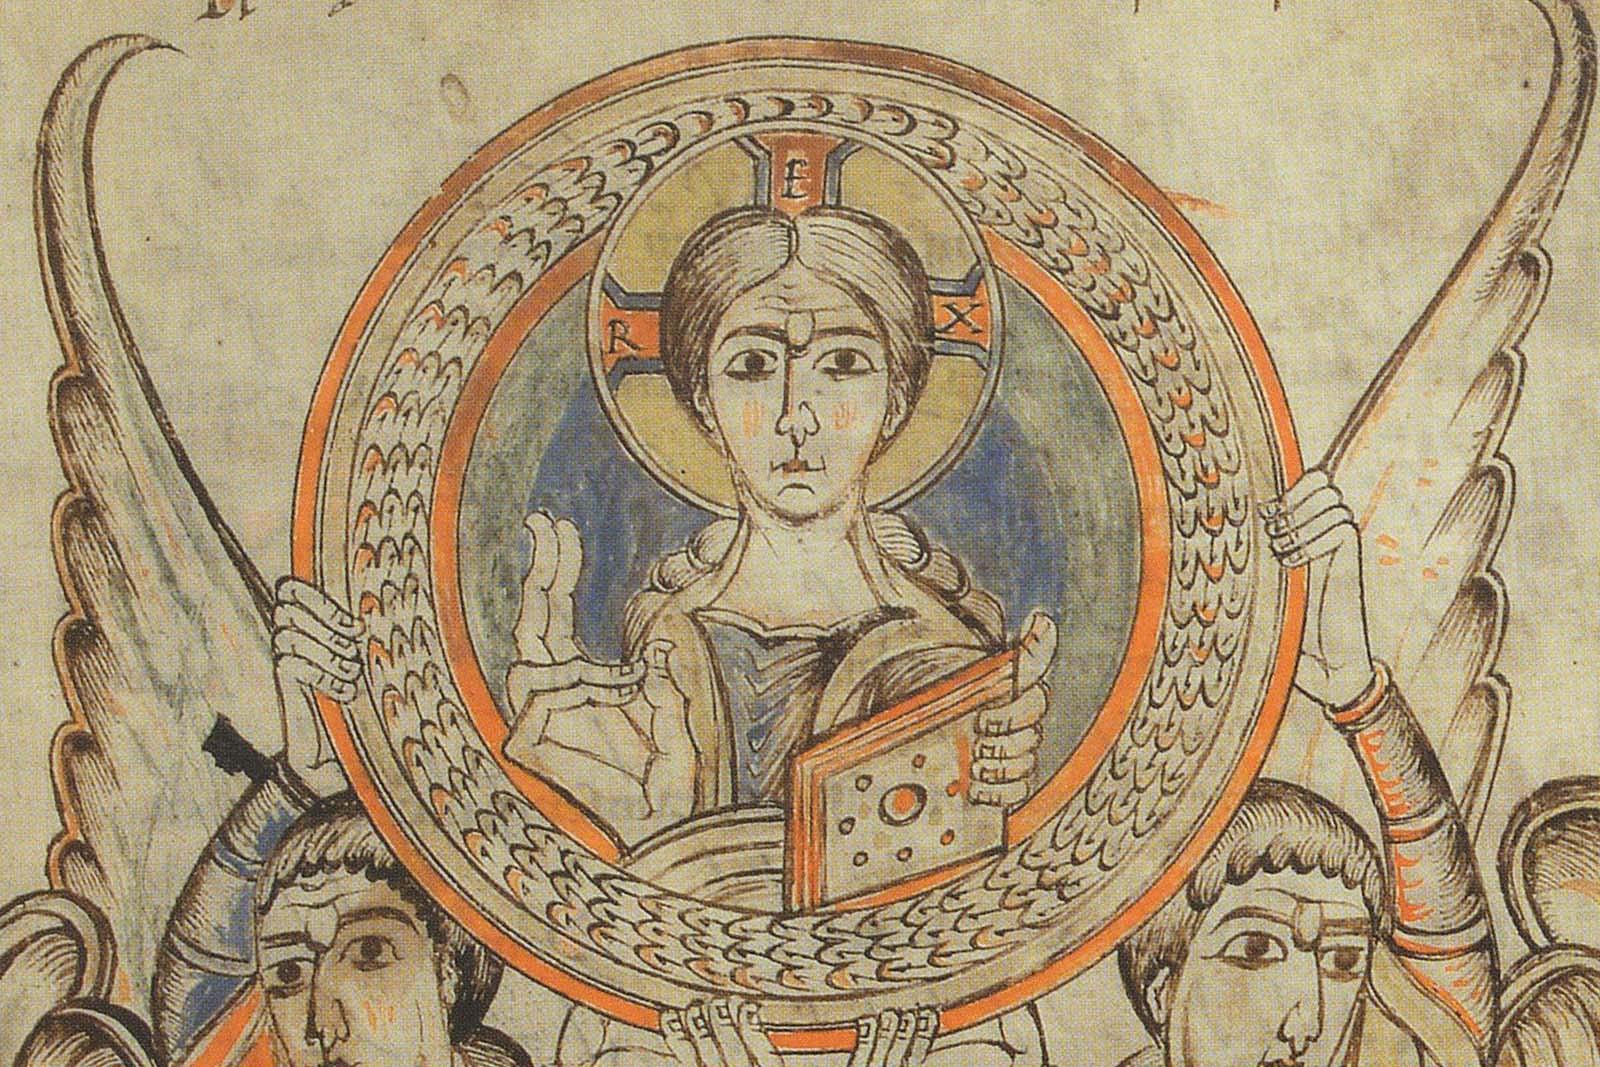 VII Corso estivo di Canto Gregoriano